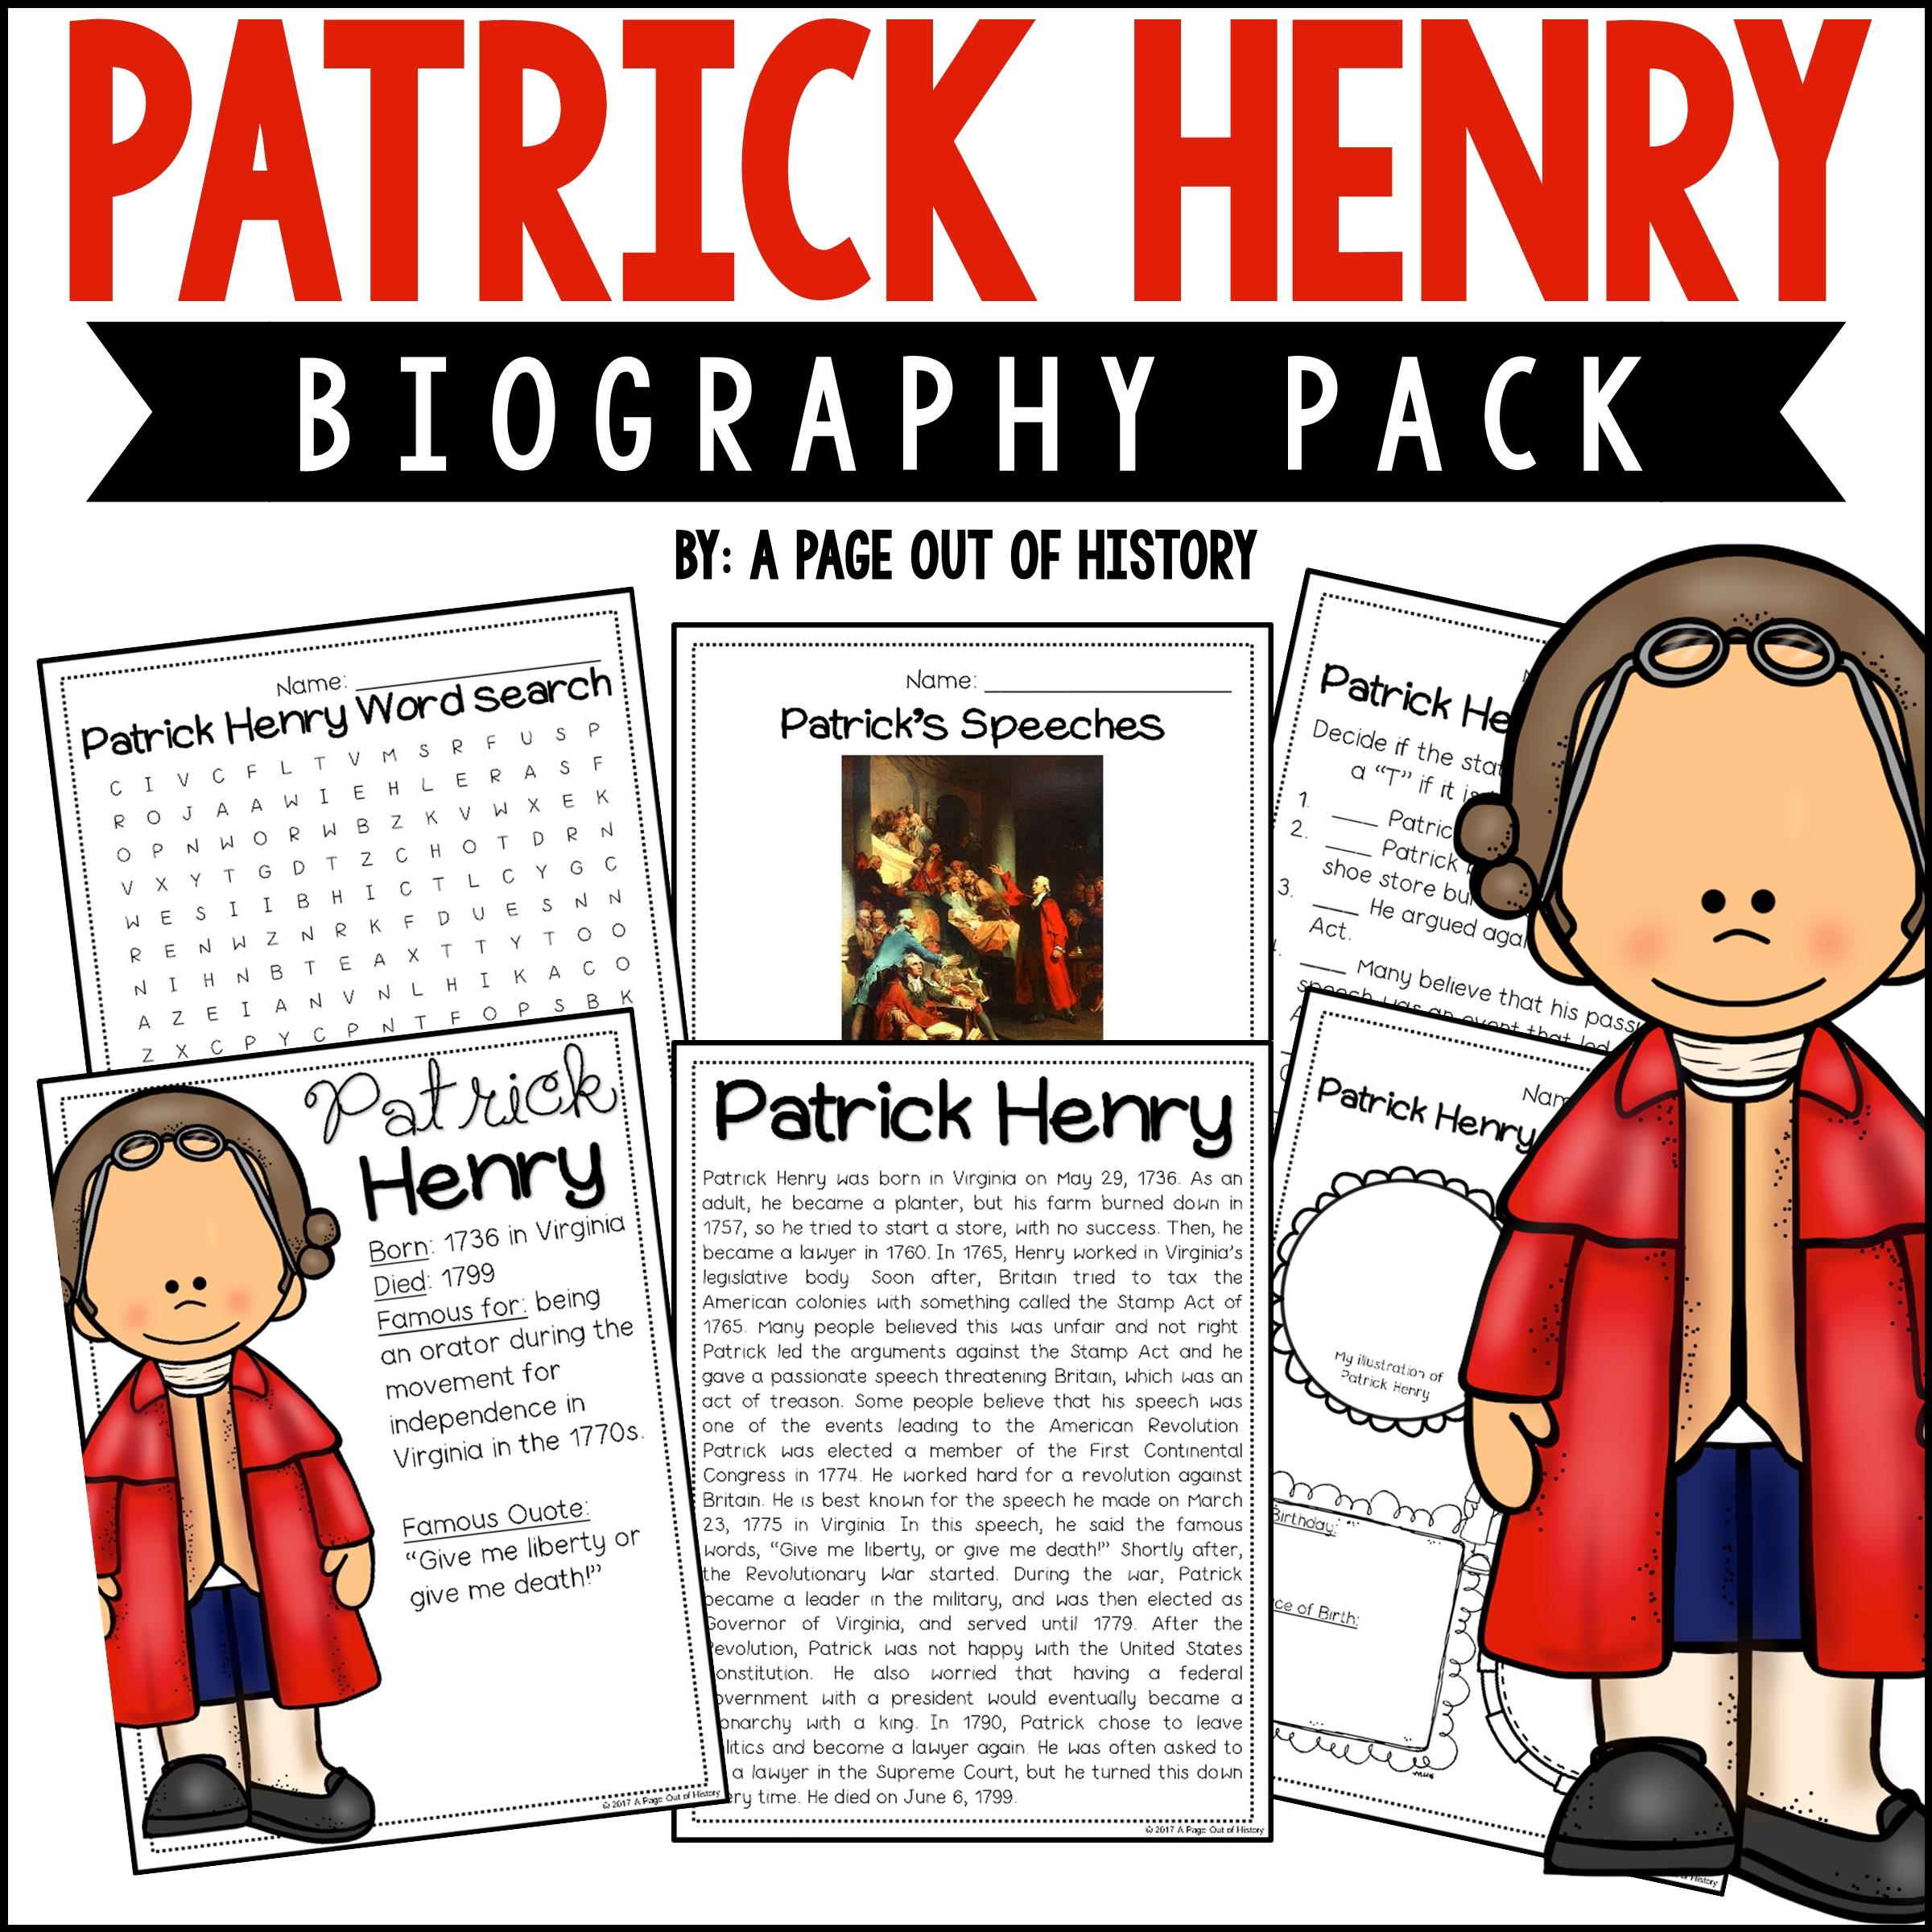 Patrick Henry Biography Pack Revolutionary Americans